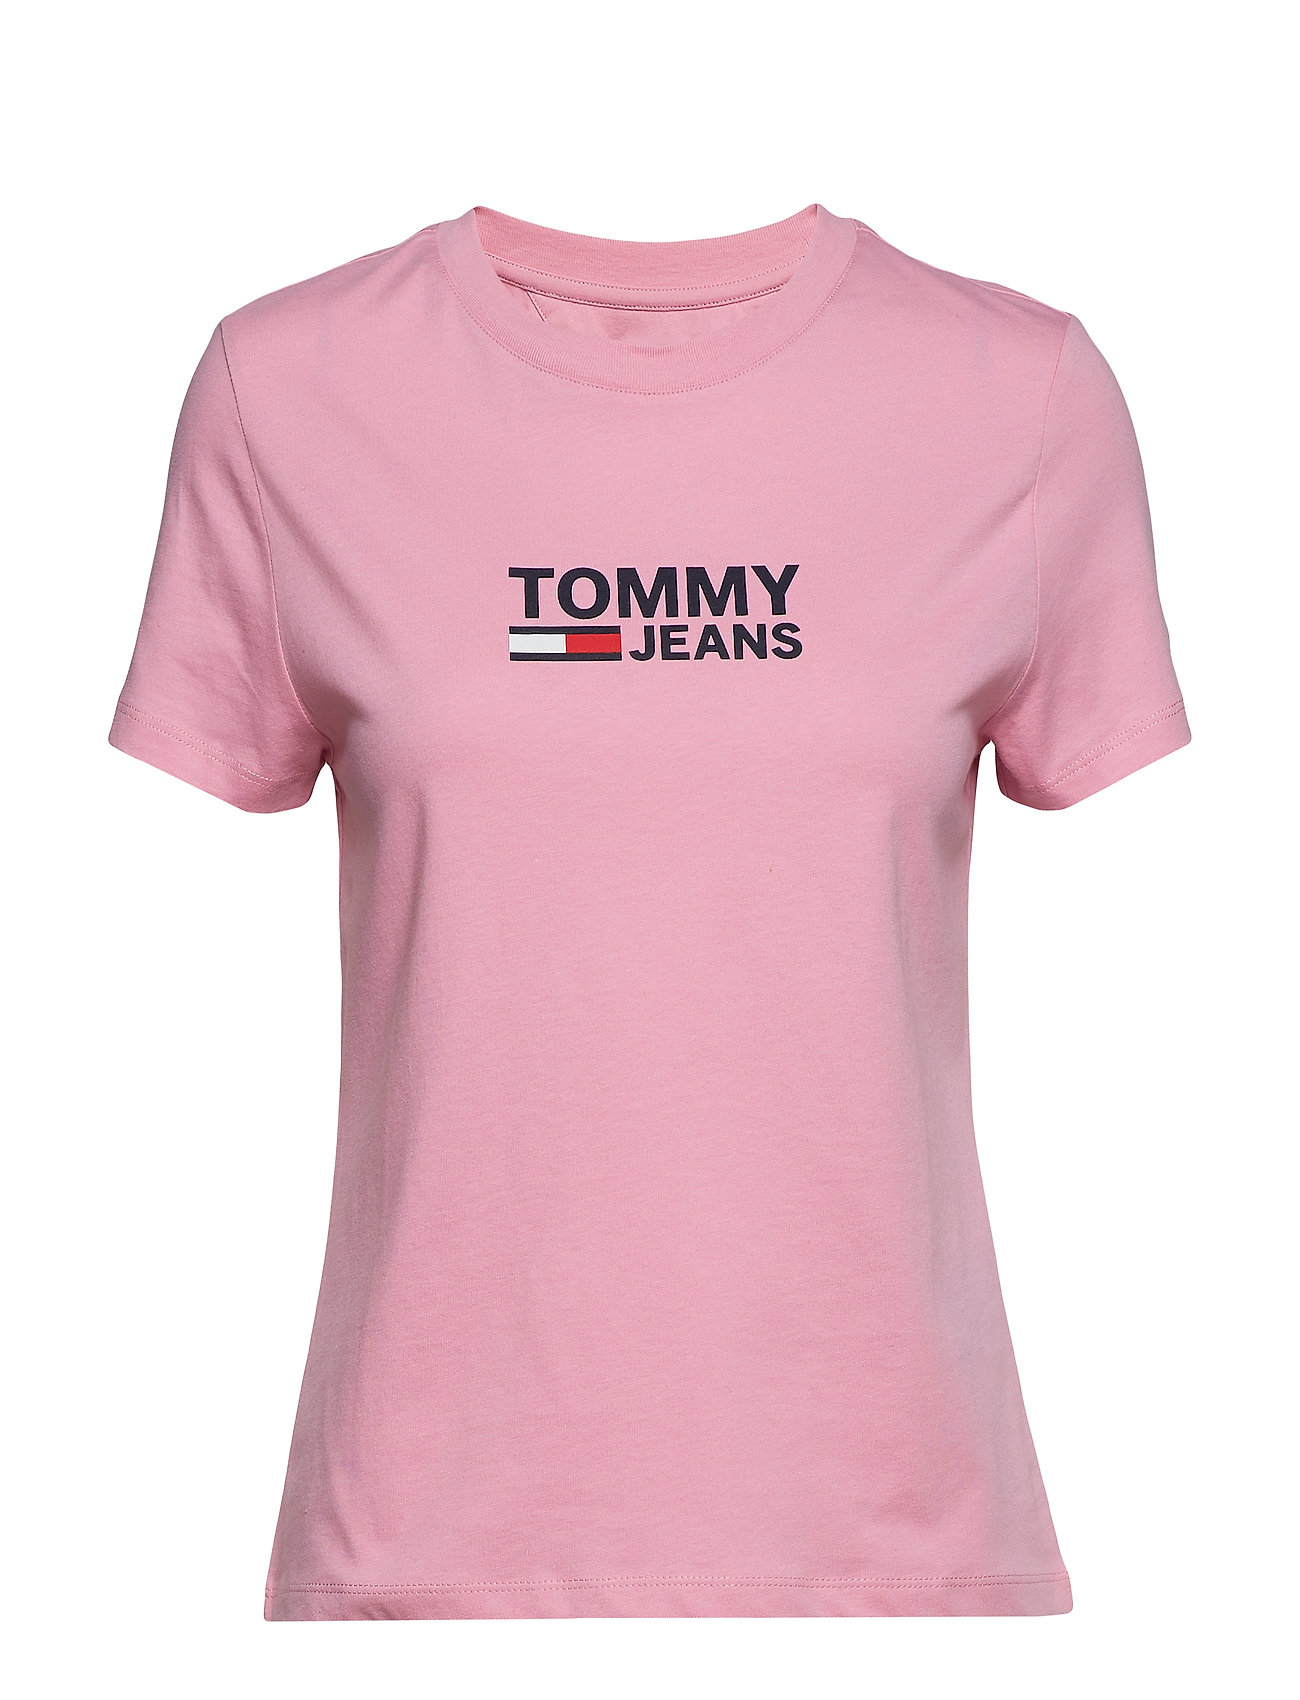 Tommy Jeans TJW CORP LOGO TEE - LILAC CHIFFON